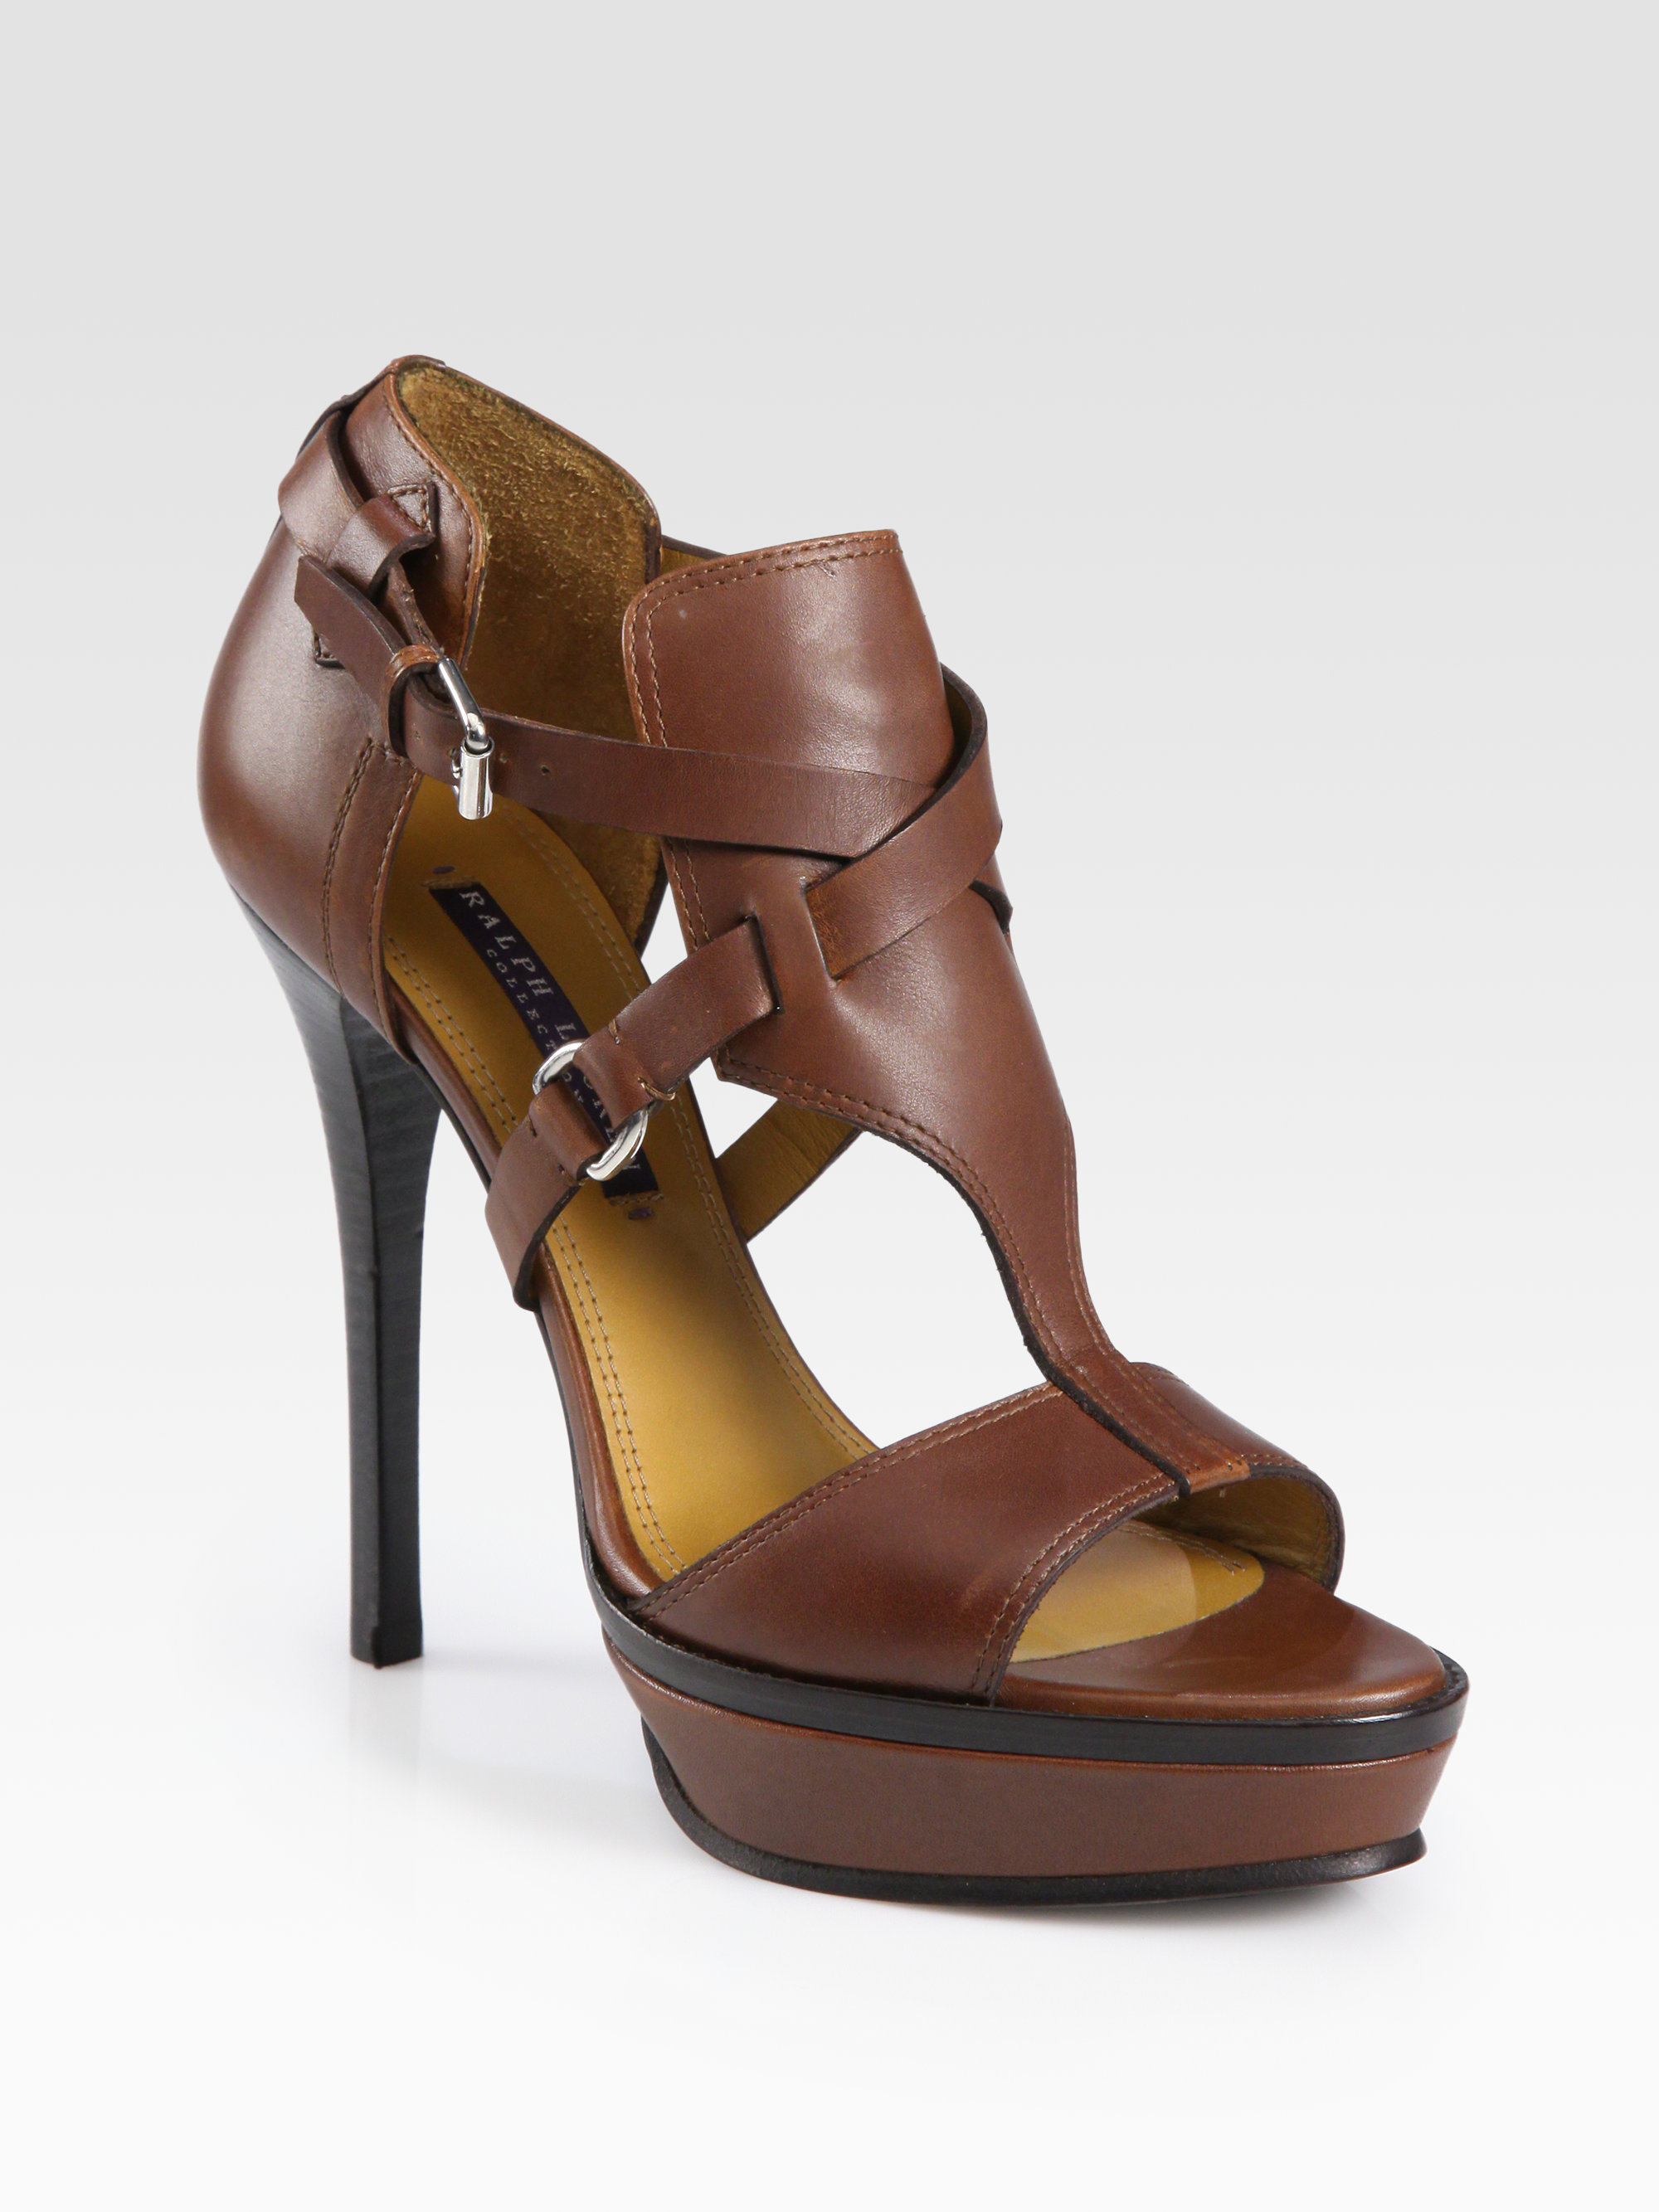 b4f03edb03b Ralph Lauren Collection Brown Leather Equestrianinspired Platform Sandals